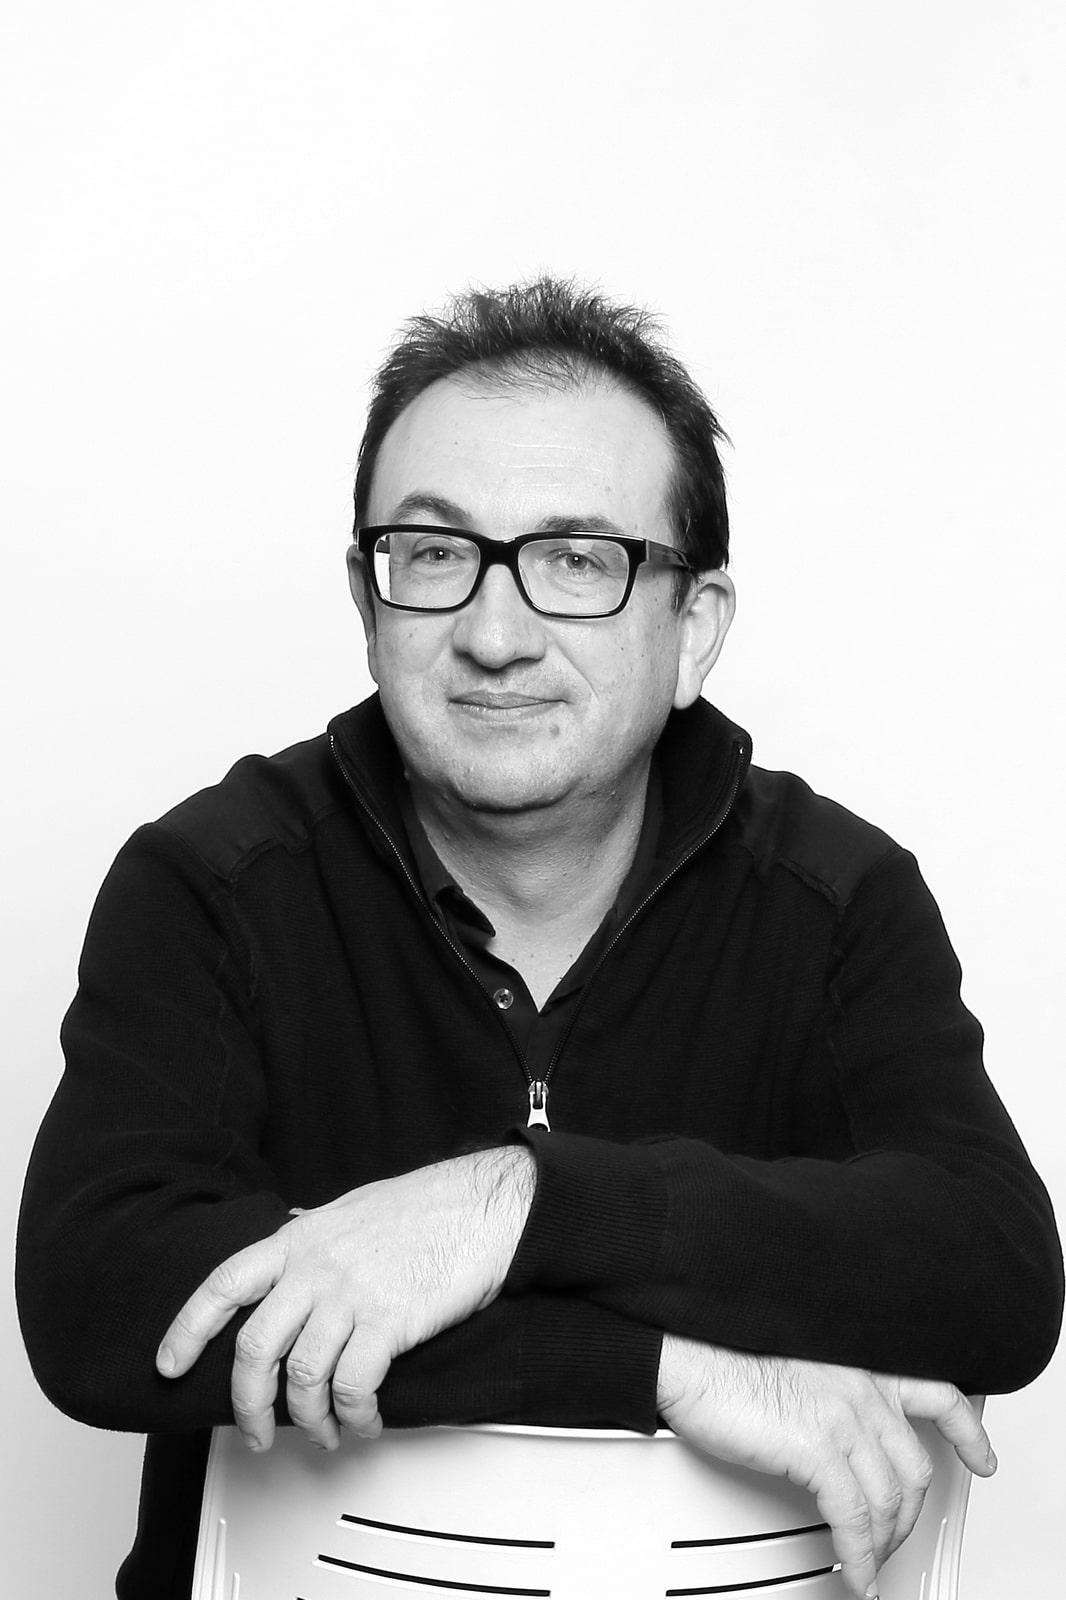 Alain Garnier Jamespot